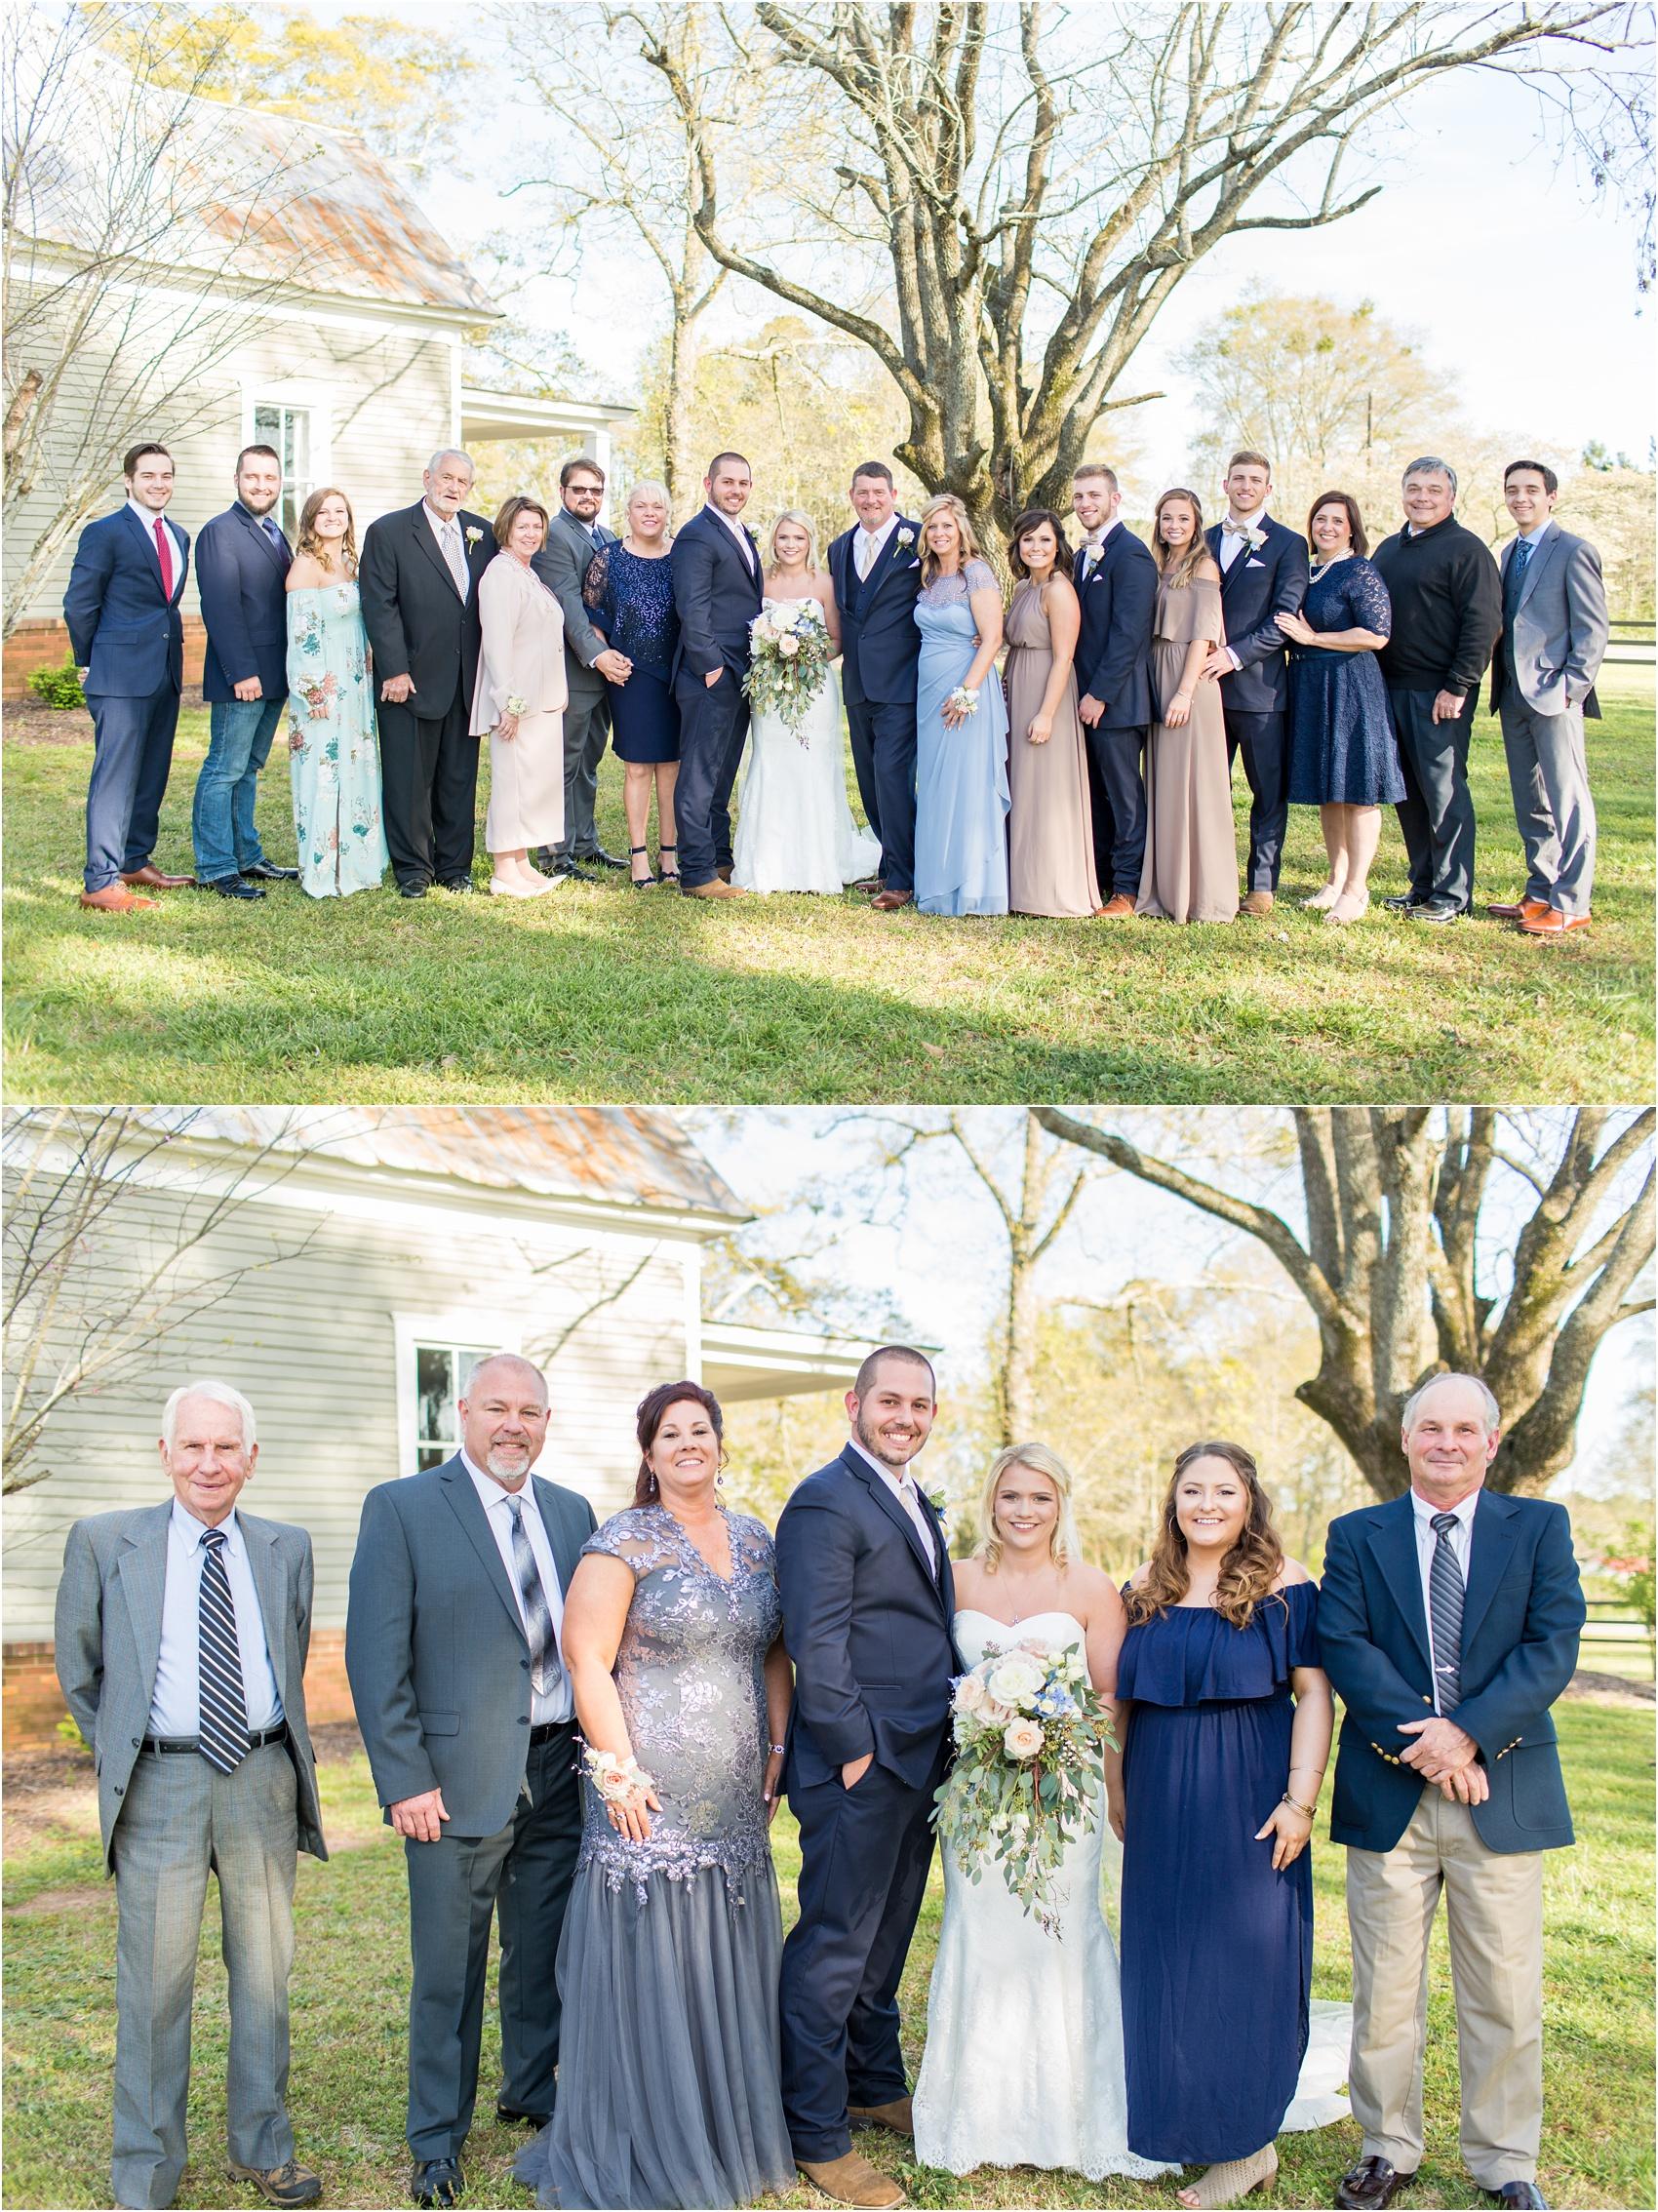 Savannah Eve Photography- Wade Wedding-56.jpg